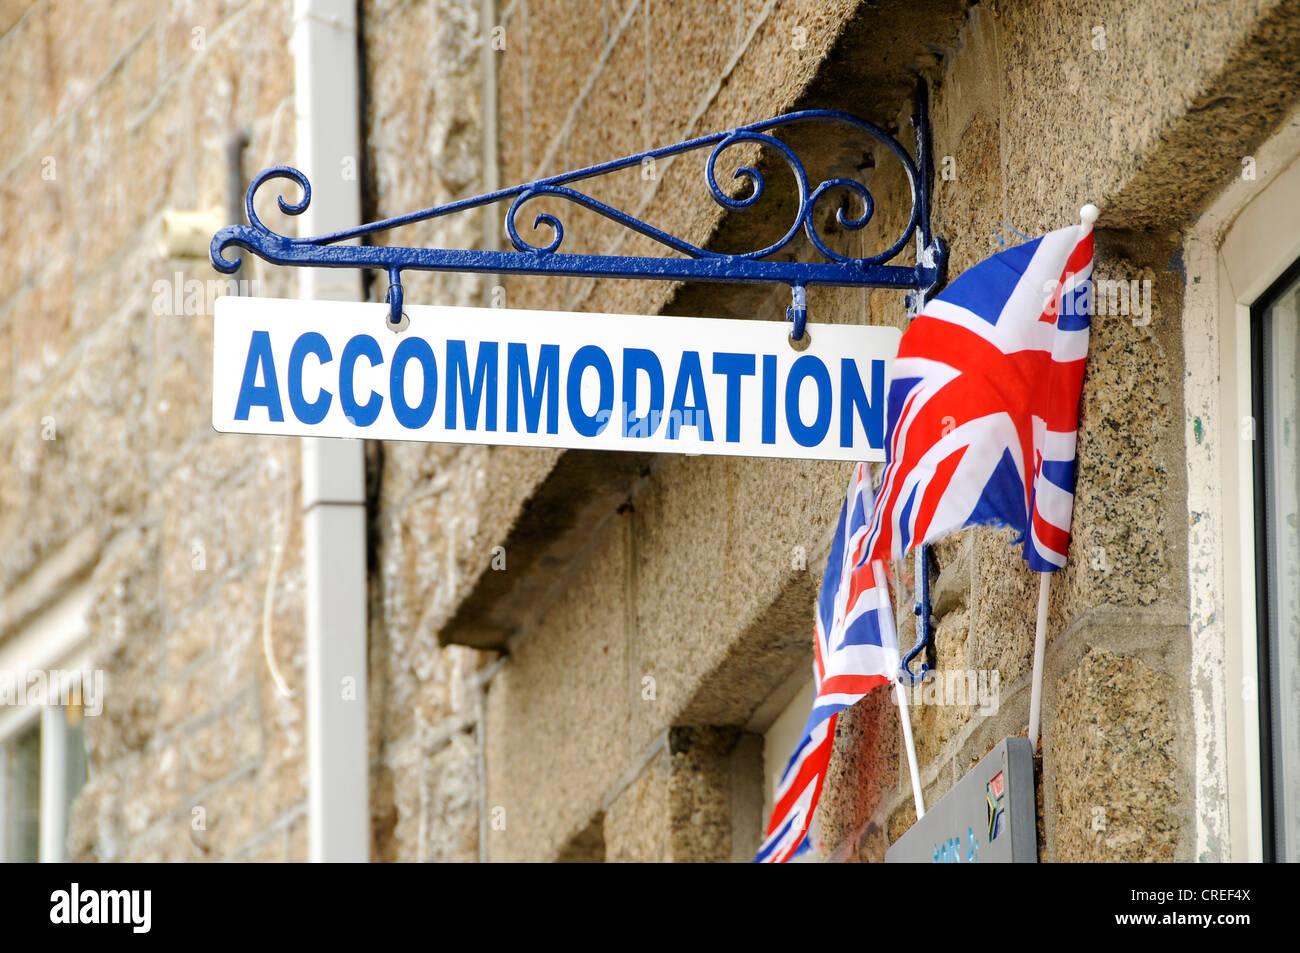 Accomodation sign outside a UK seaside hotel with union jack flags as decoration - Stock Image